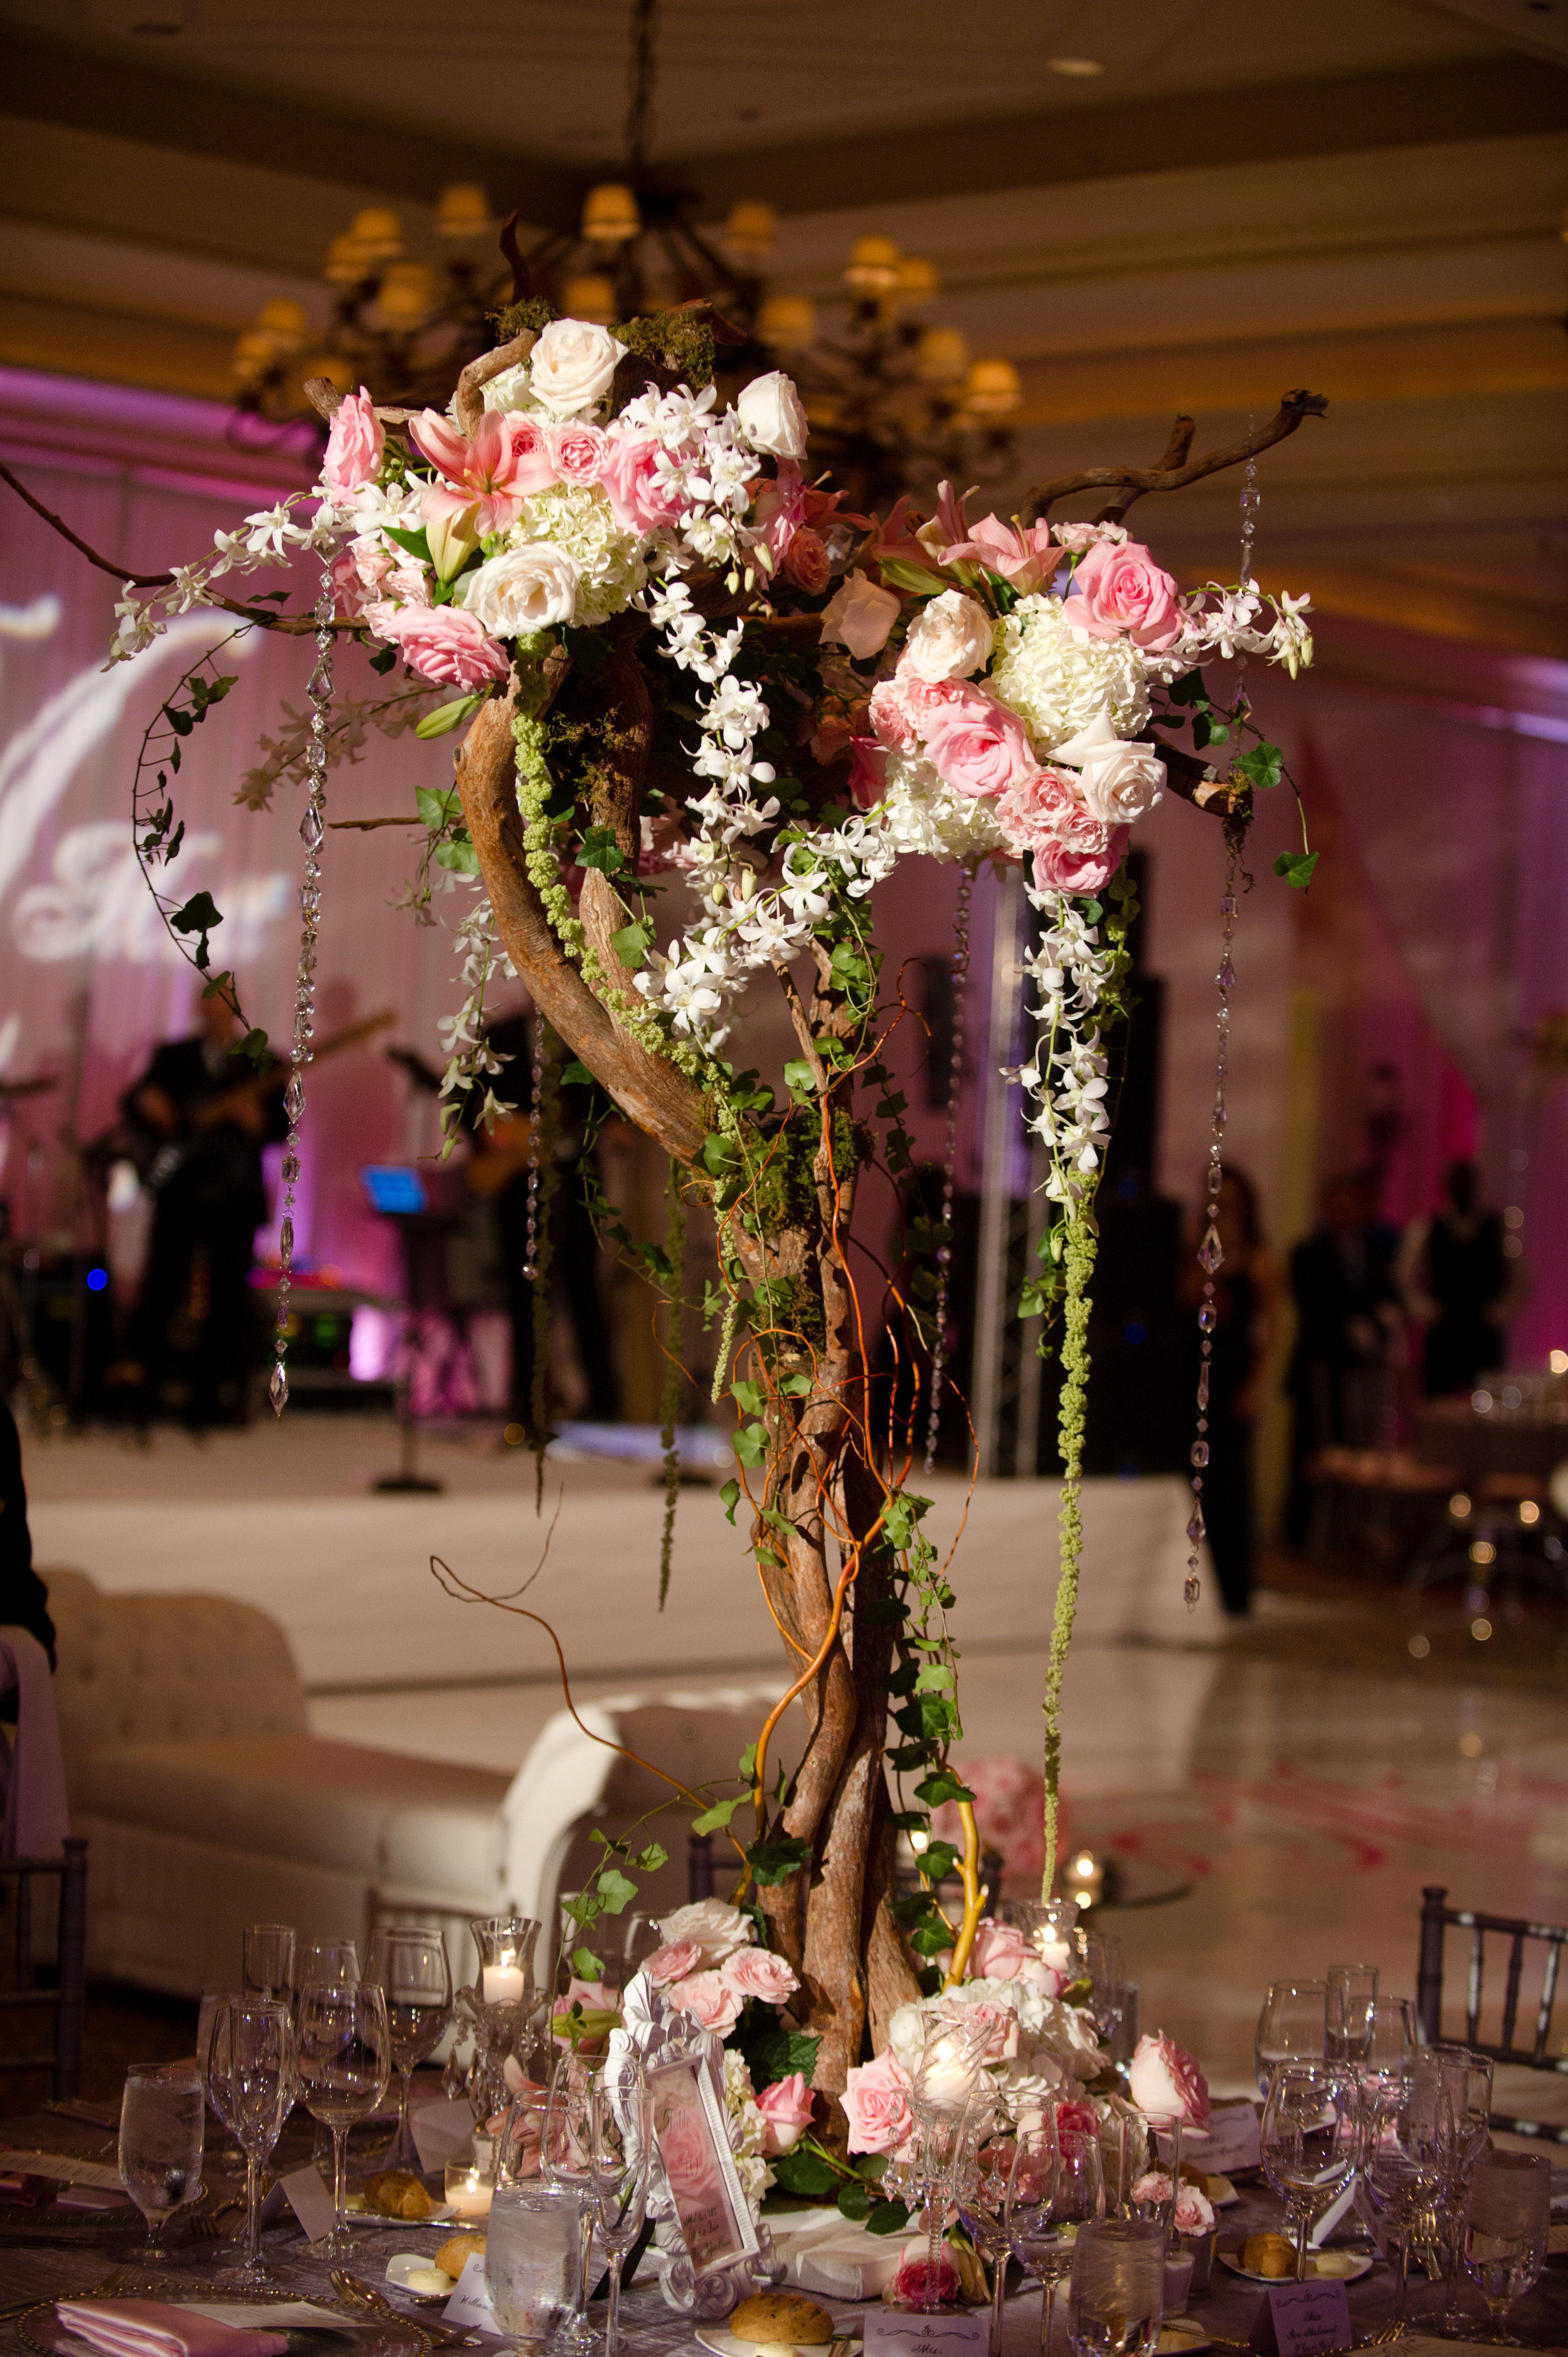 How to plan a wedding - Wedding Flowers